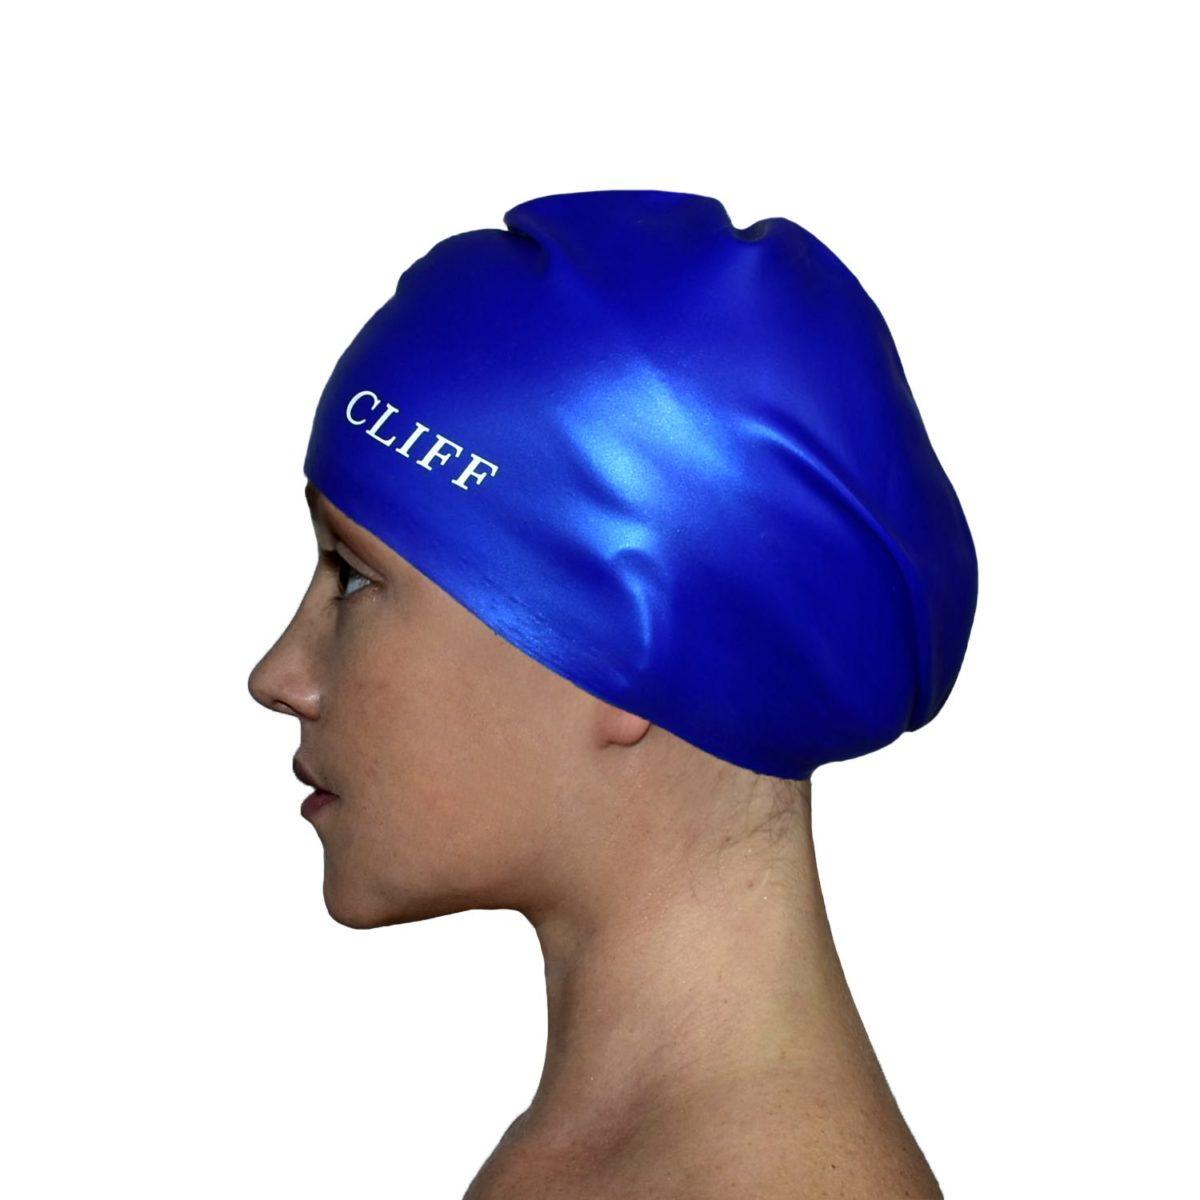 CLIFF Шапочка для плавания силикон. д/длинных волос  CS13/2: синий - 1